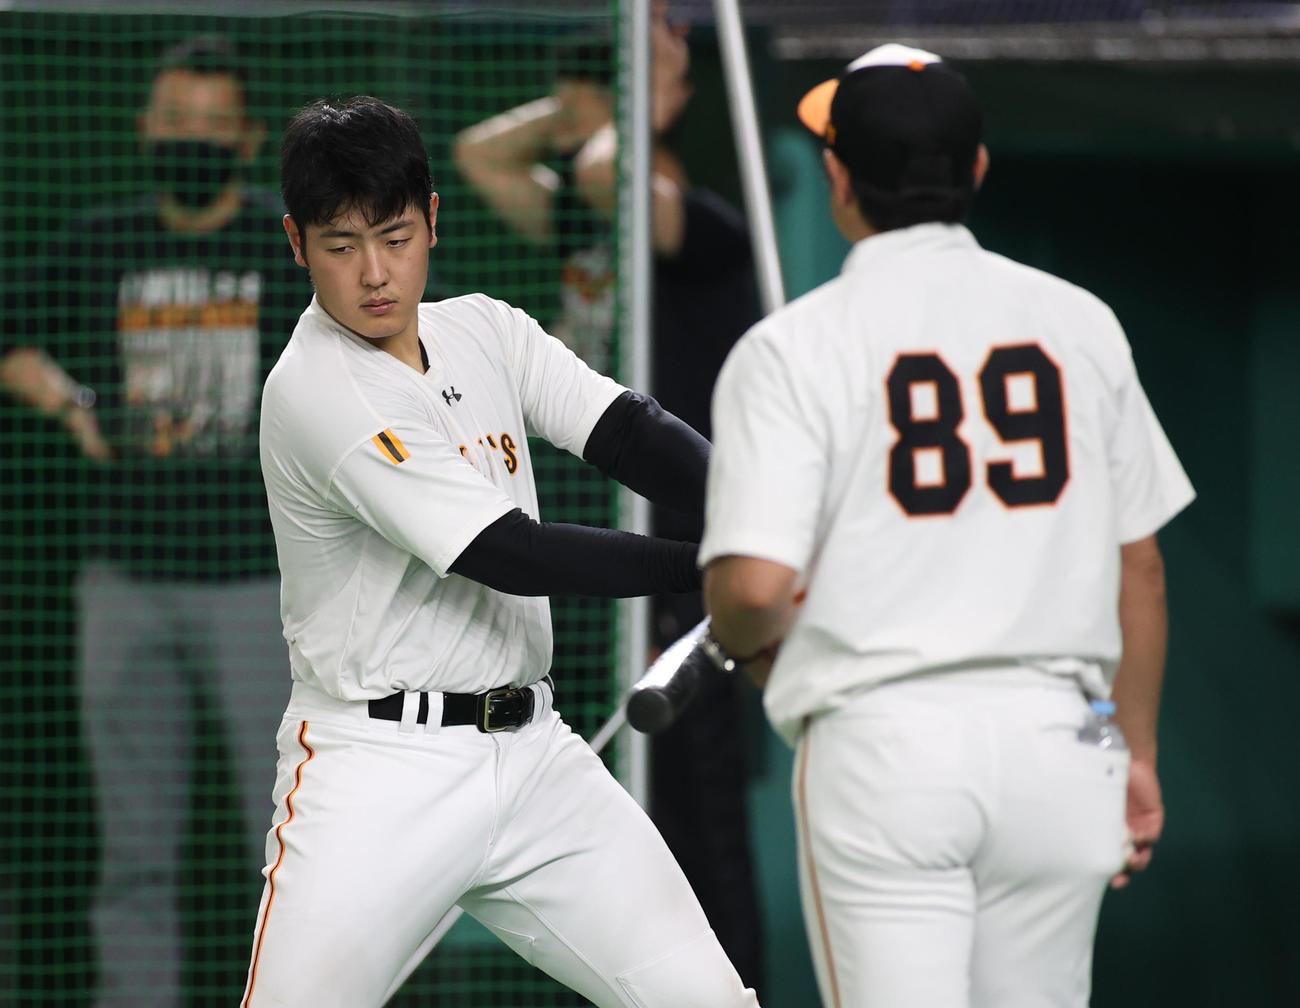 巨人対阪神 試合前、ティー打撃を行う巨人岡本(撮影・河野匠)